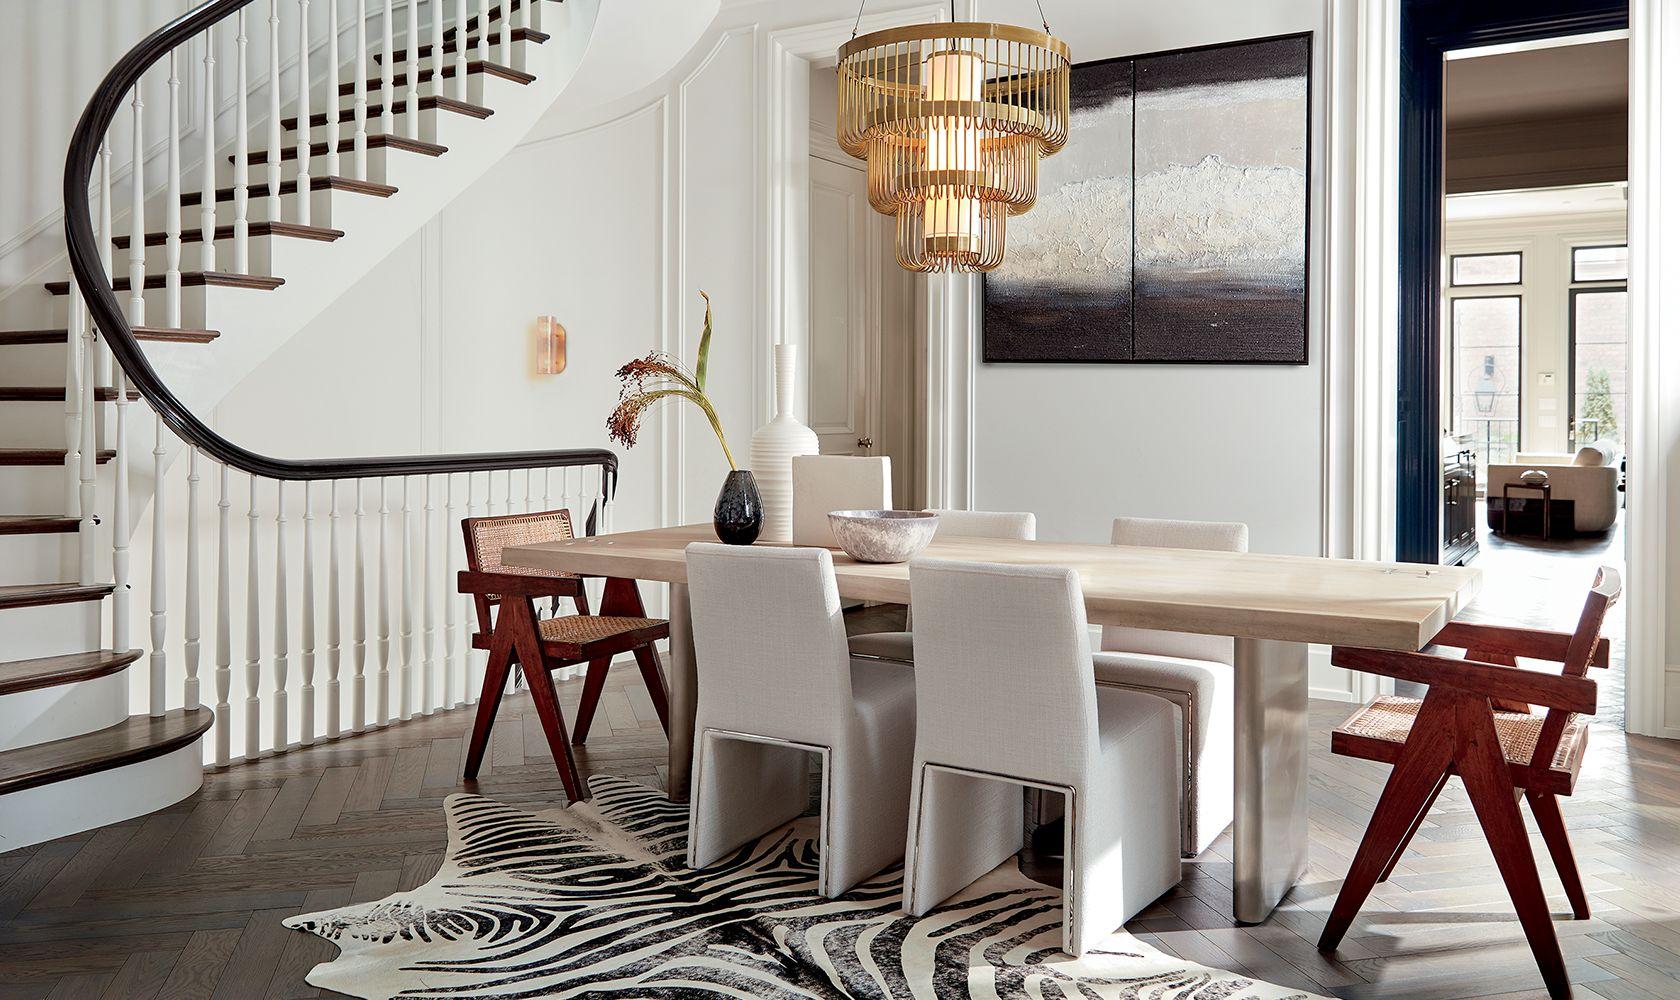 Unique Furniture: Modern + Edgy